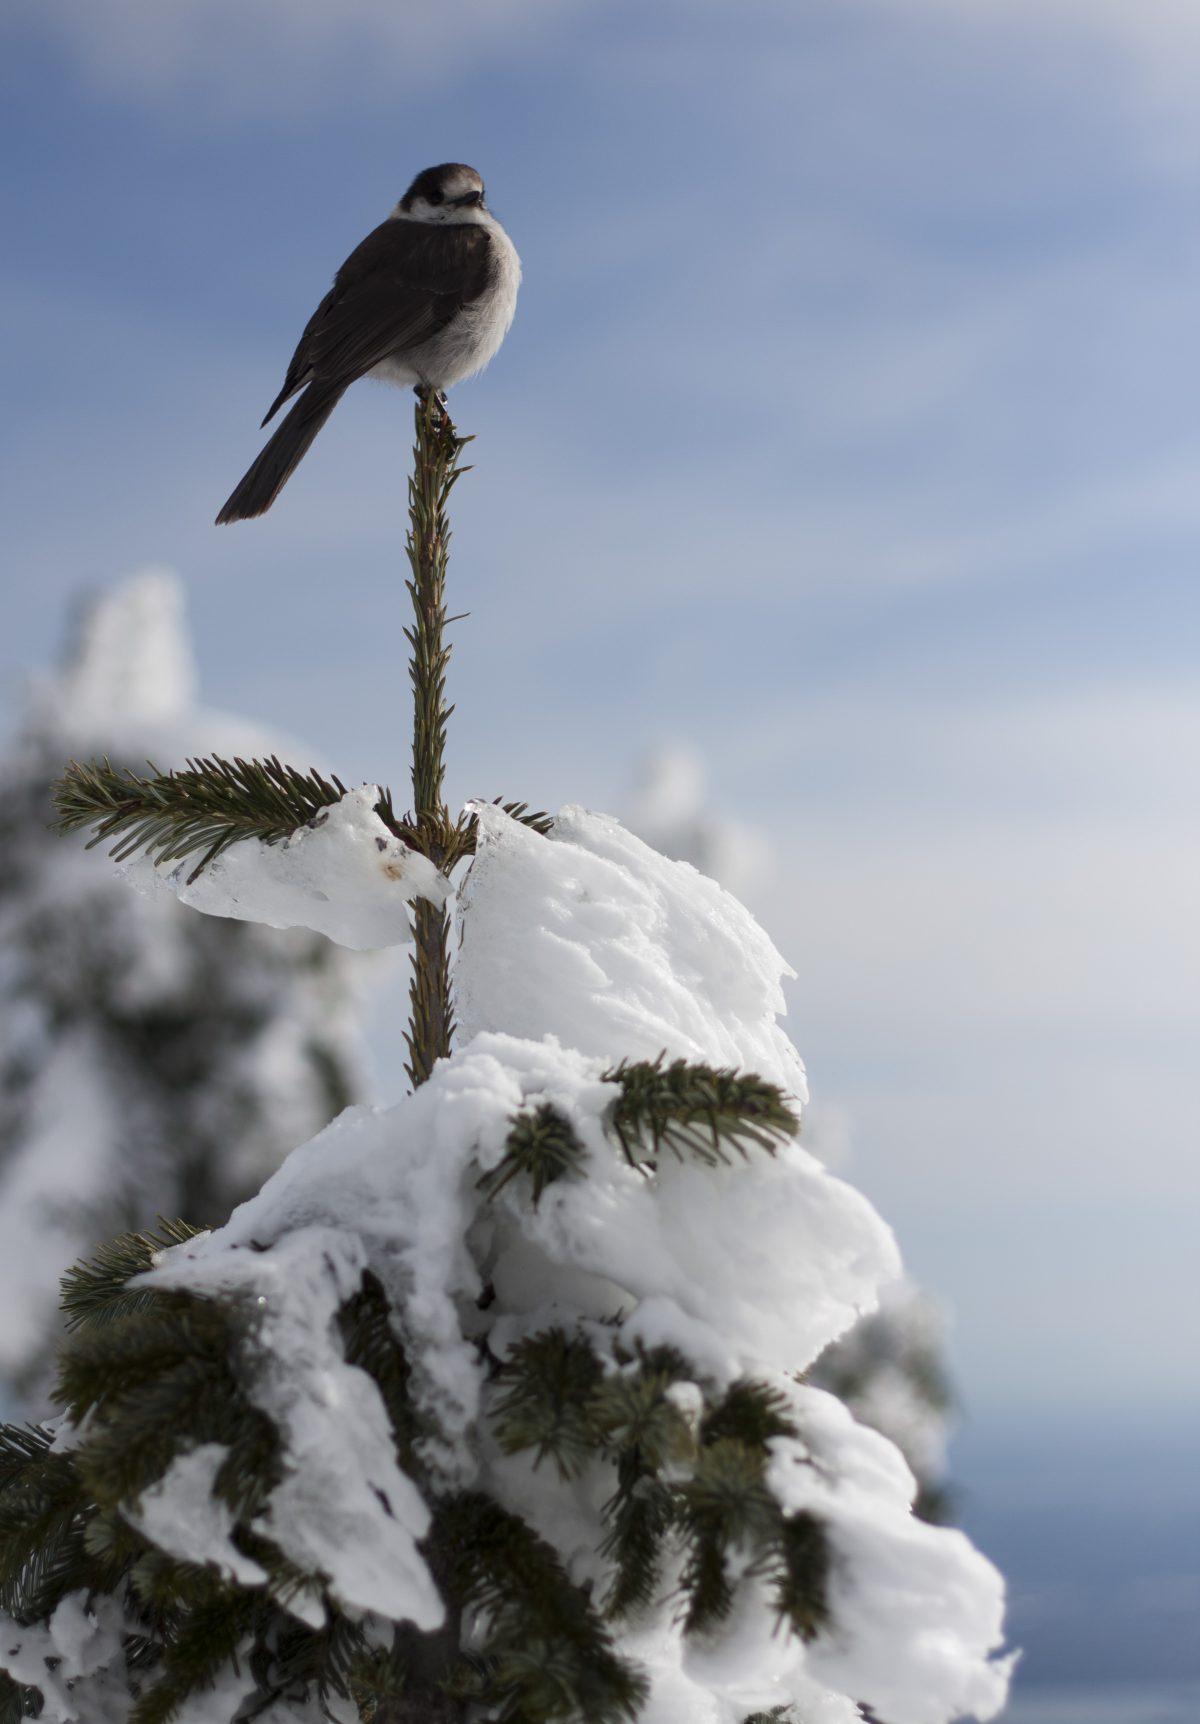 Bird - Snowshoeing at Cypress mountain, snow, tree, bird